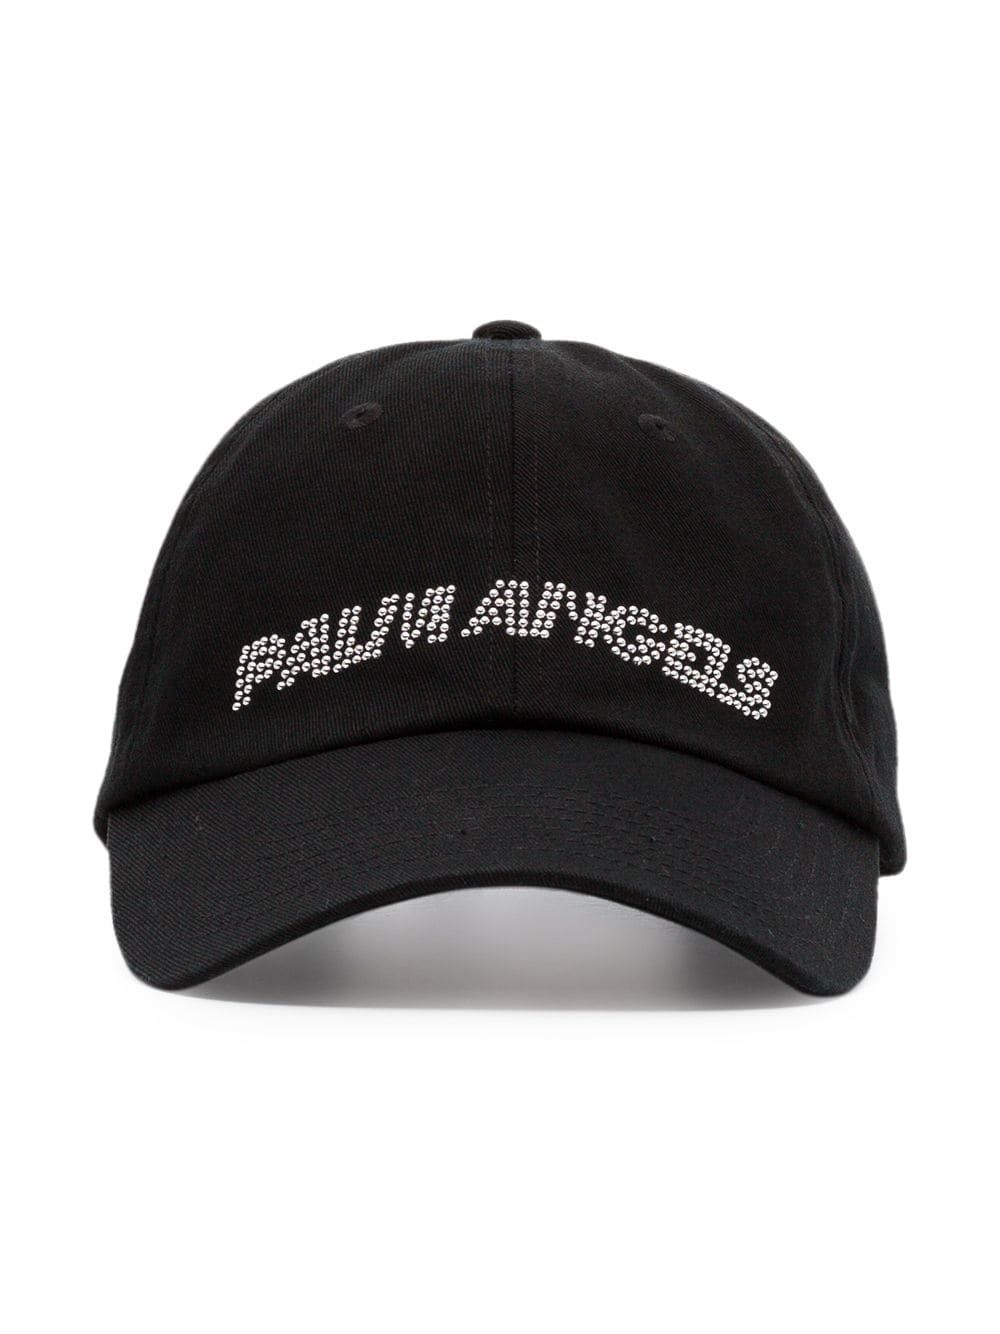 47e47f5bd5d PALM ANGELS PALM ANGELS PRECIOUS LOGO PRINT BASEBALL CAP - BLACK.   palmangels